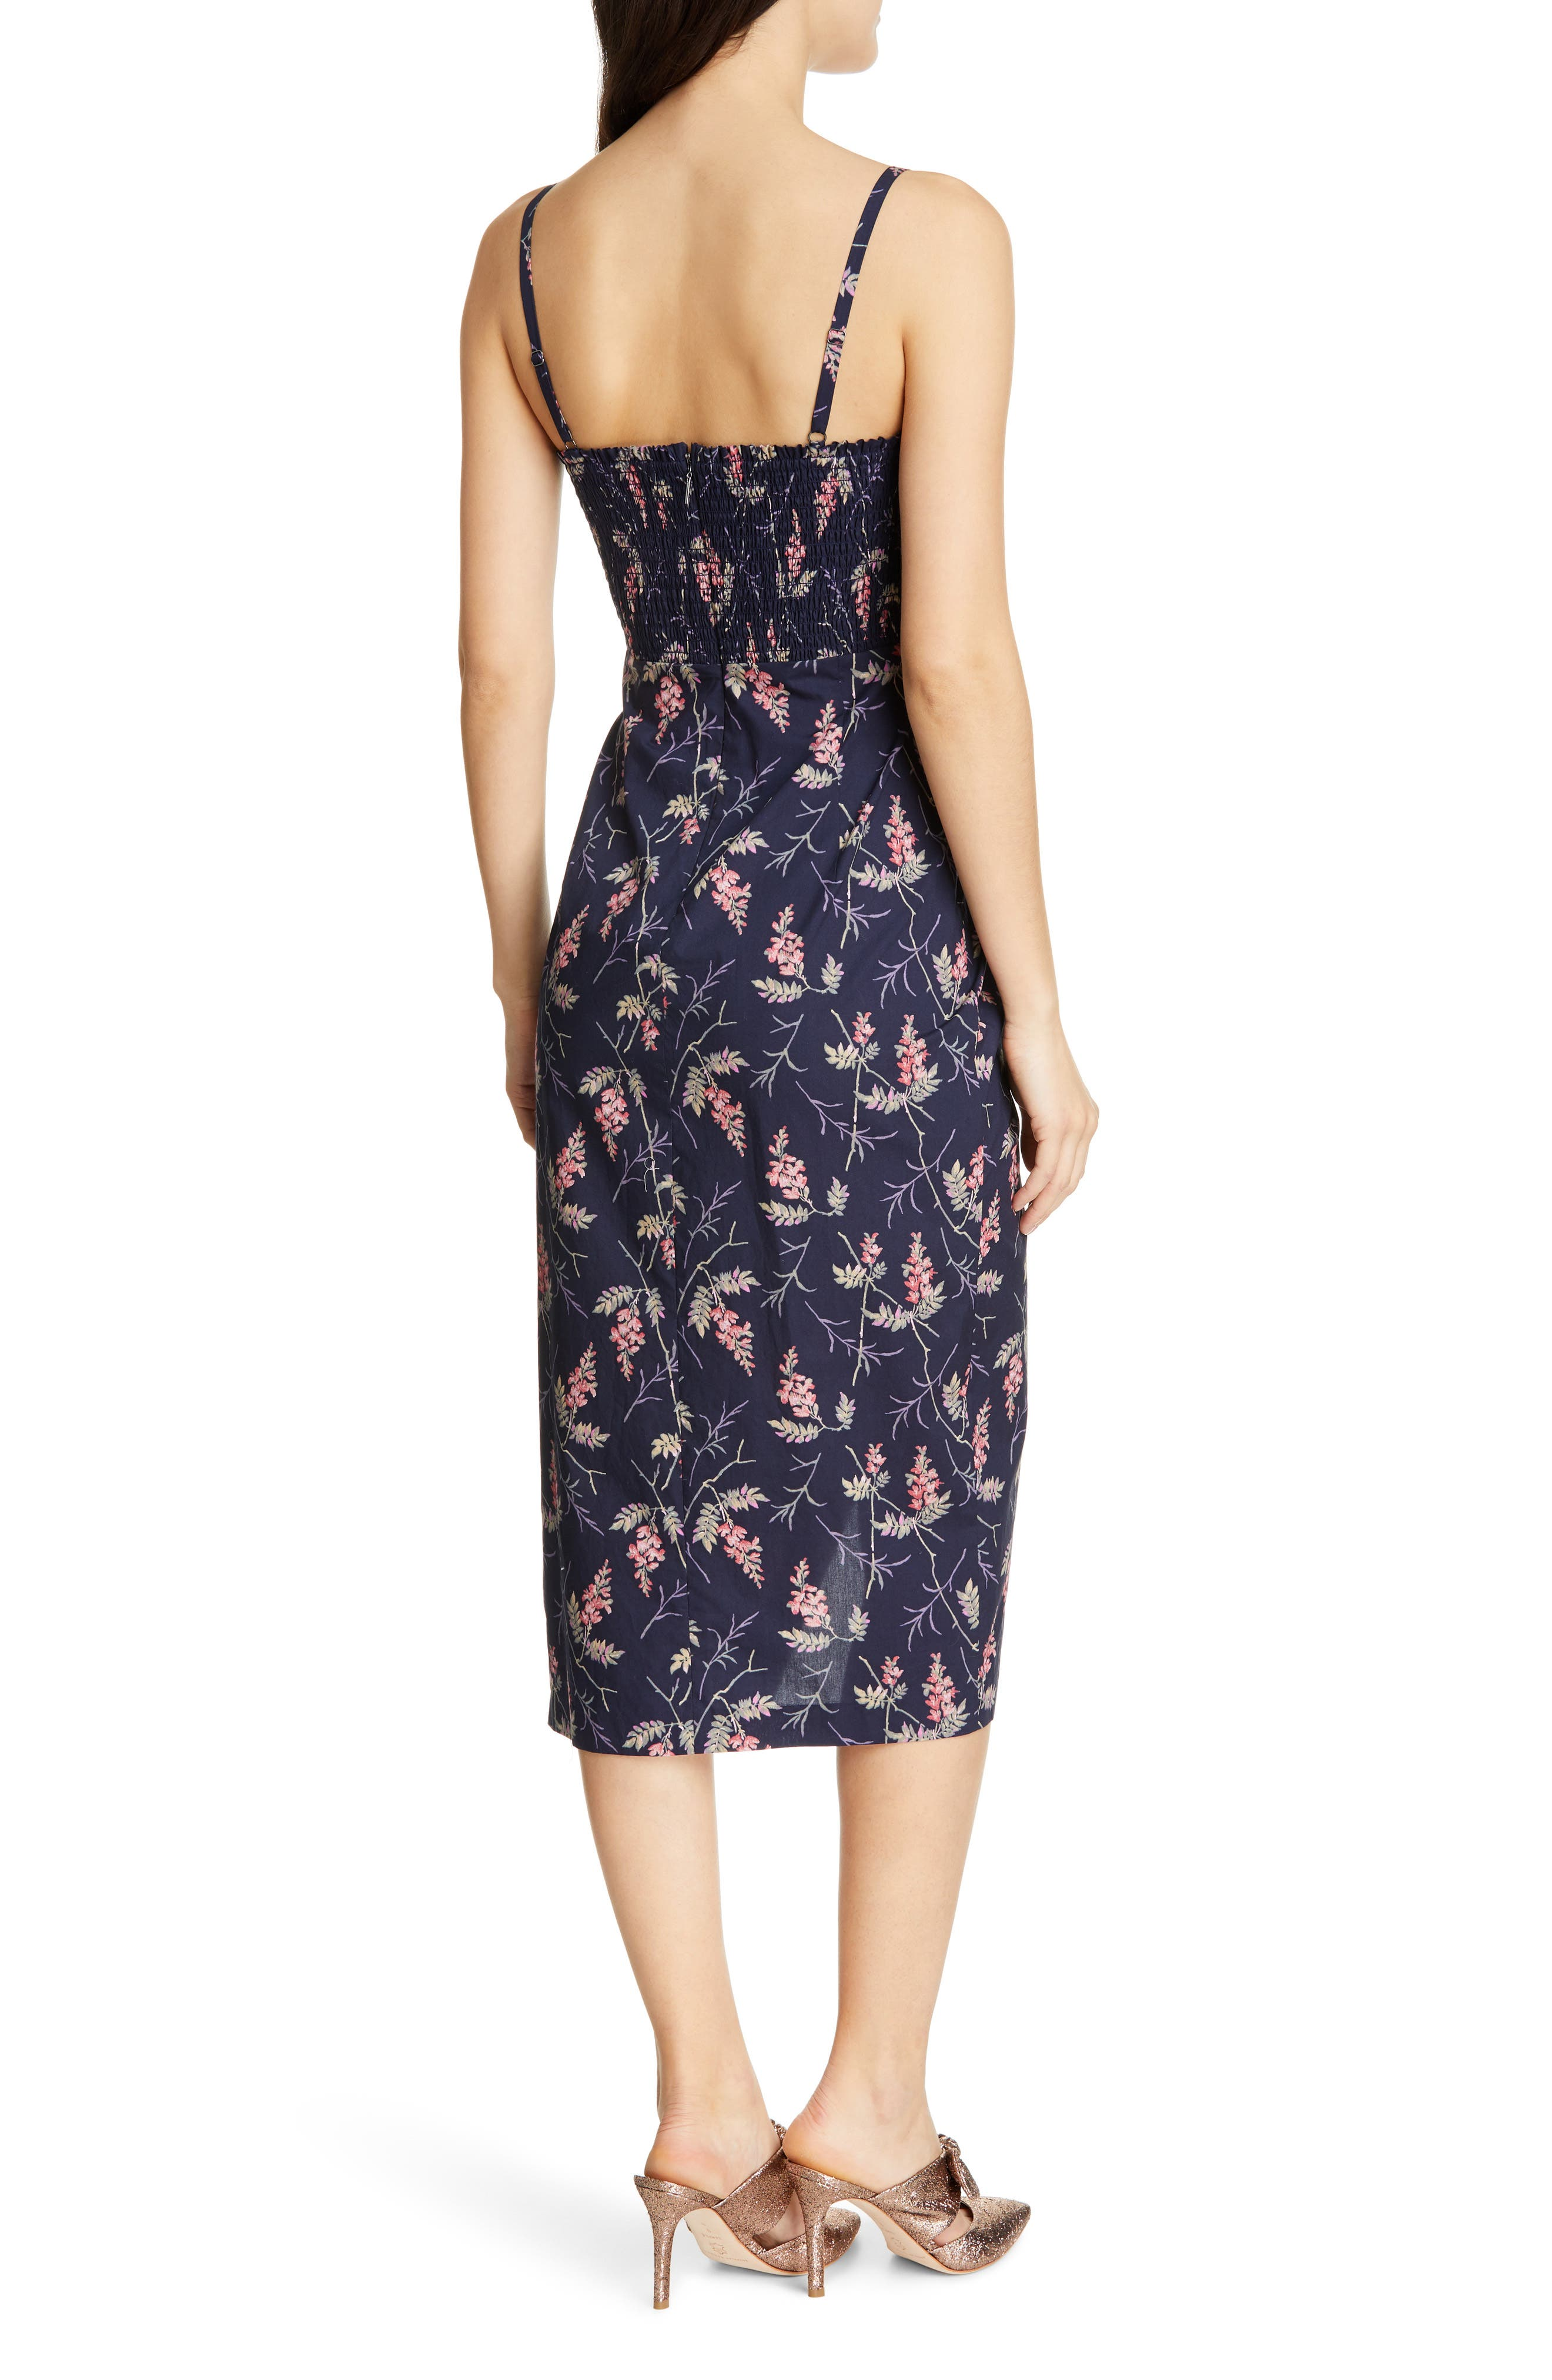 REBECCA TAYLOR, Ivie Floral Sleeveless Cotton Midi Sundress, Alternate thumbnail 2, color, NAVY COMBO